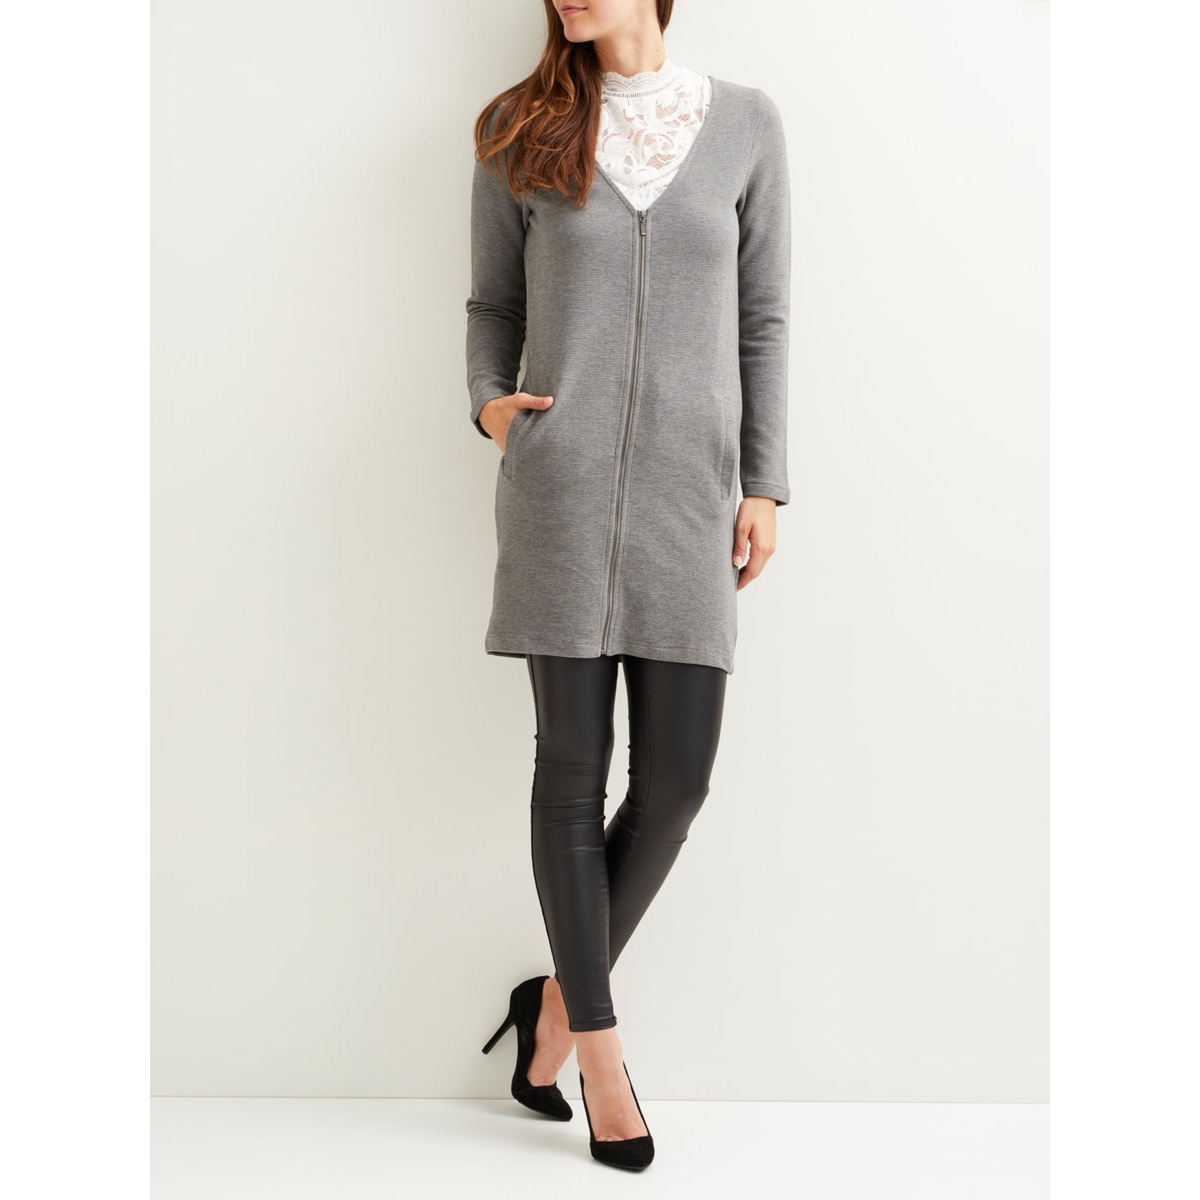 objsanko l/s cardigan 93 23025268 object vest medium grey melange